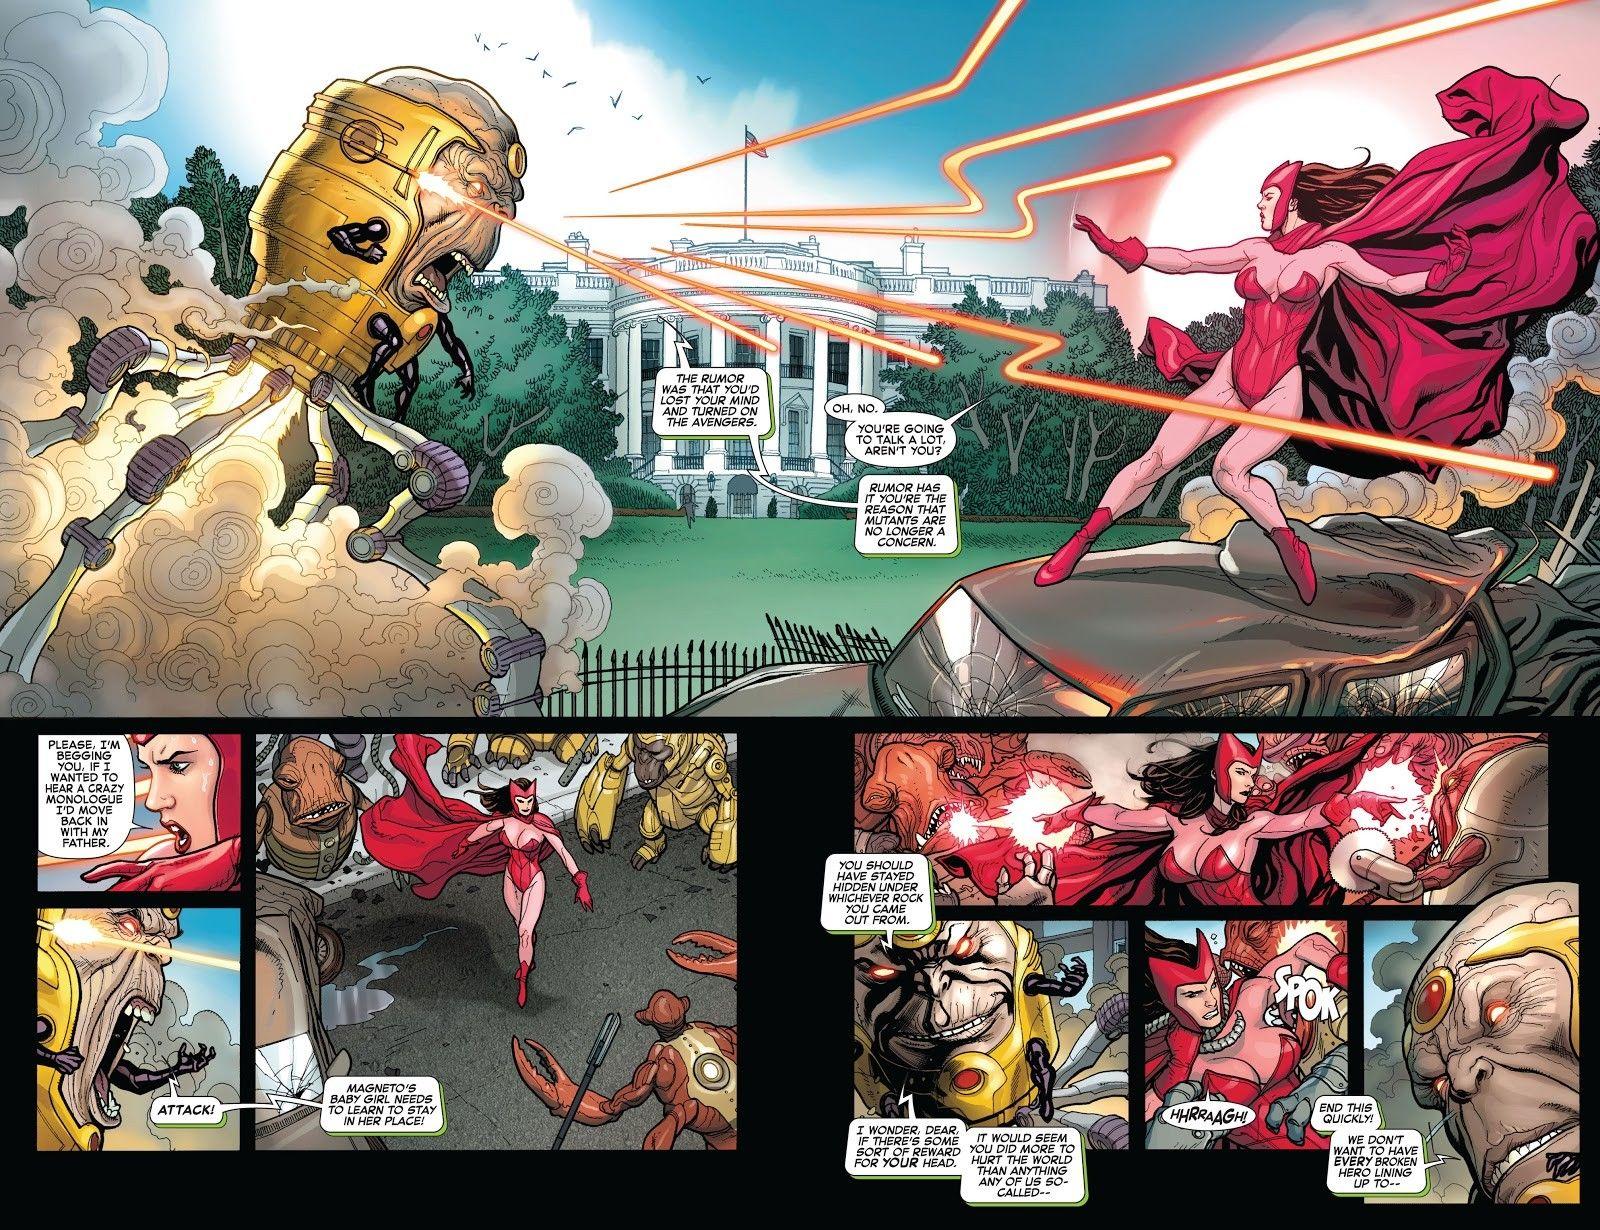 Avengers Vs X Men 0 In 2020 Marvel Comics Art Frank Cho Comic Art Community